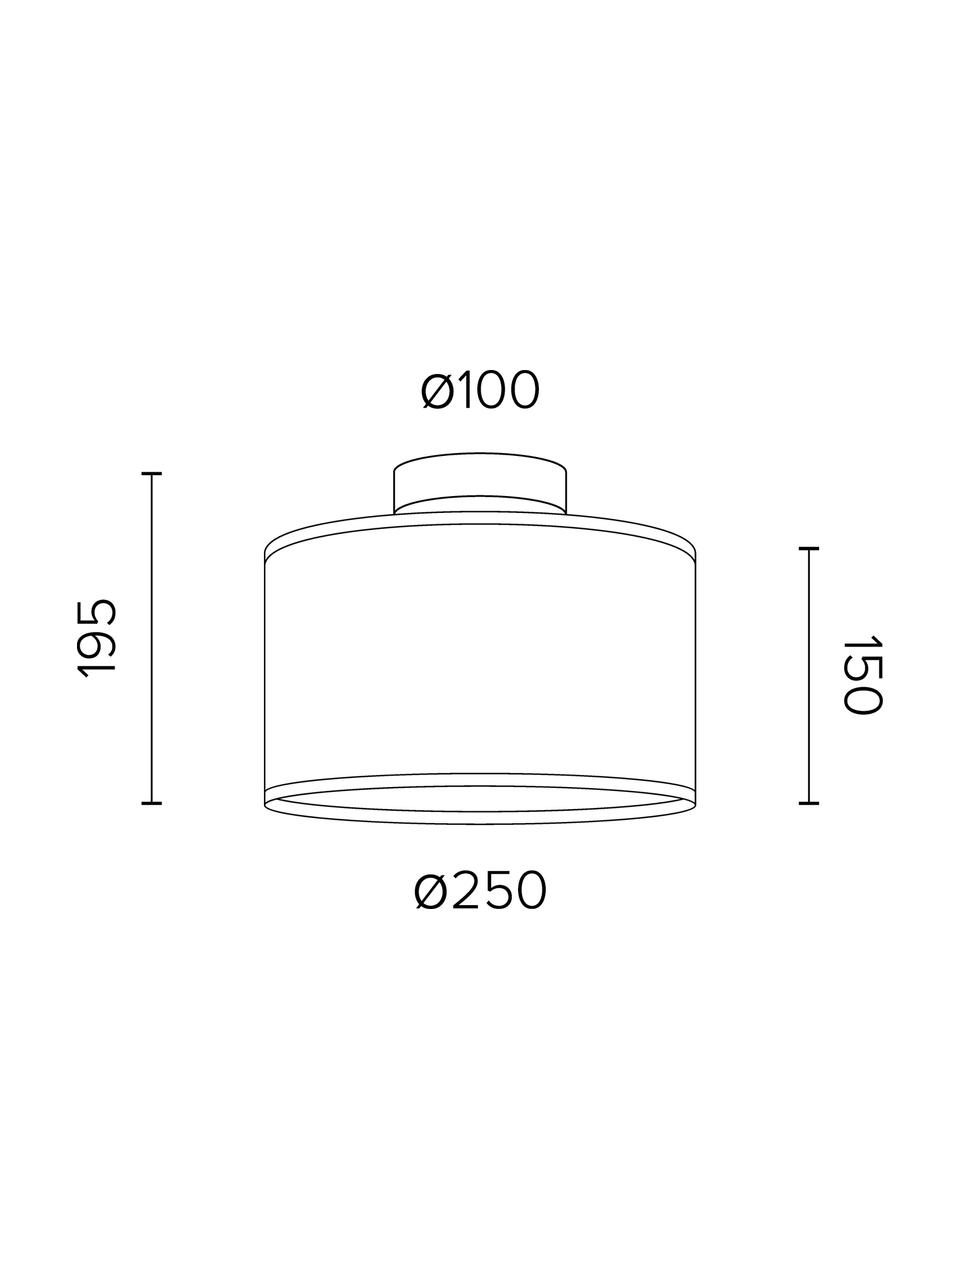 Lampada in similpelle Trece, Paralume: similpelle, Baldacchino: metallo verniciato a polv, Nero, Ø 25 x Alt. 20 cm